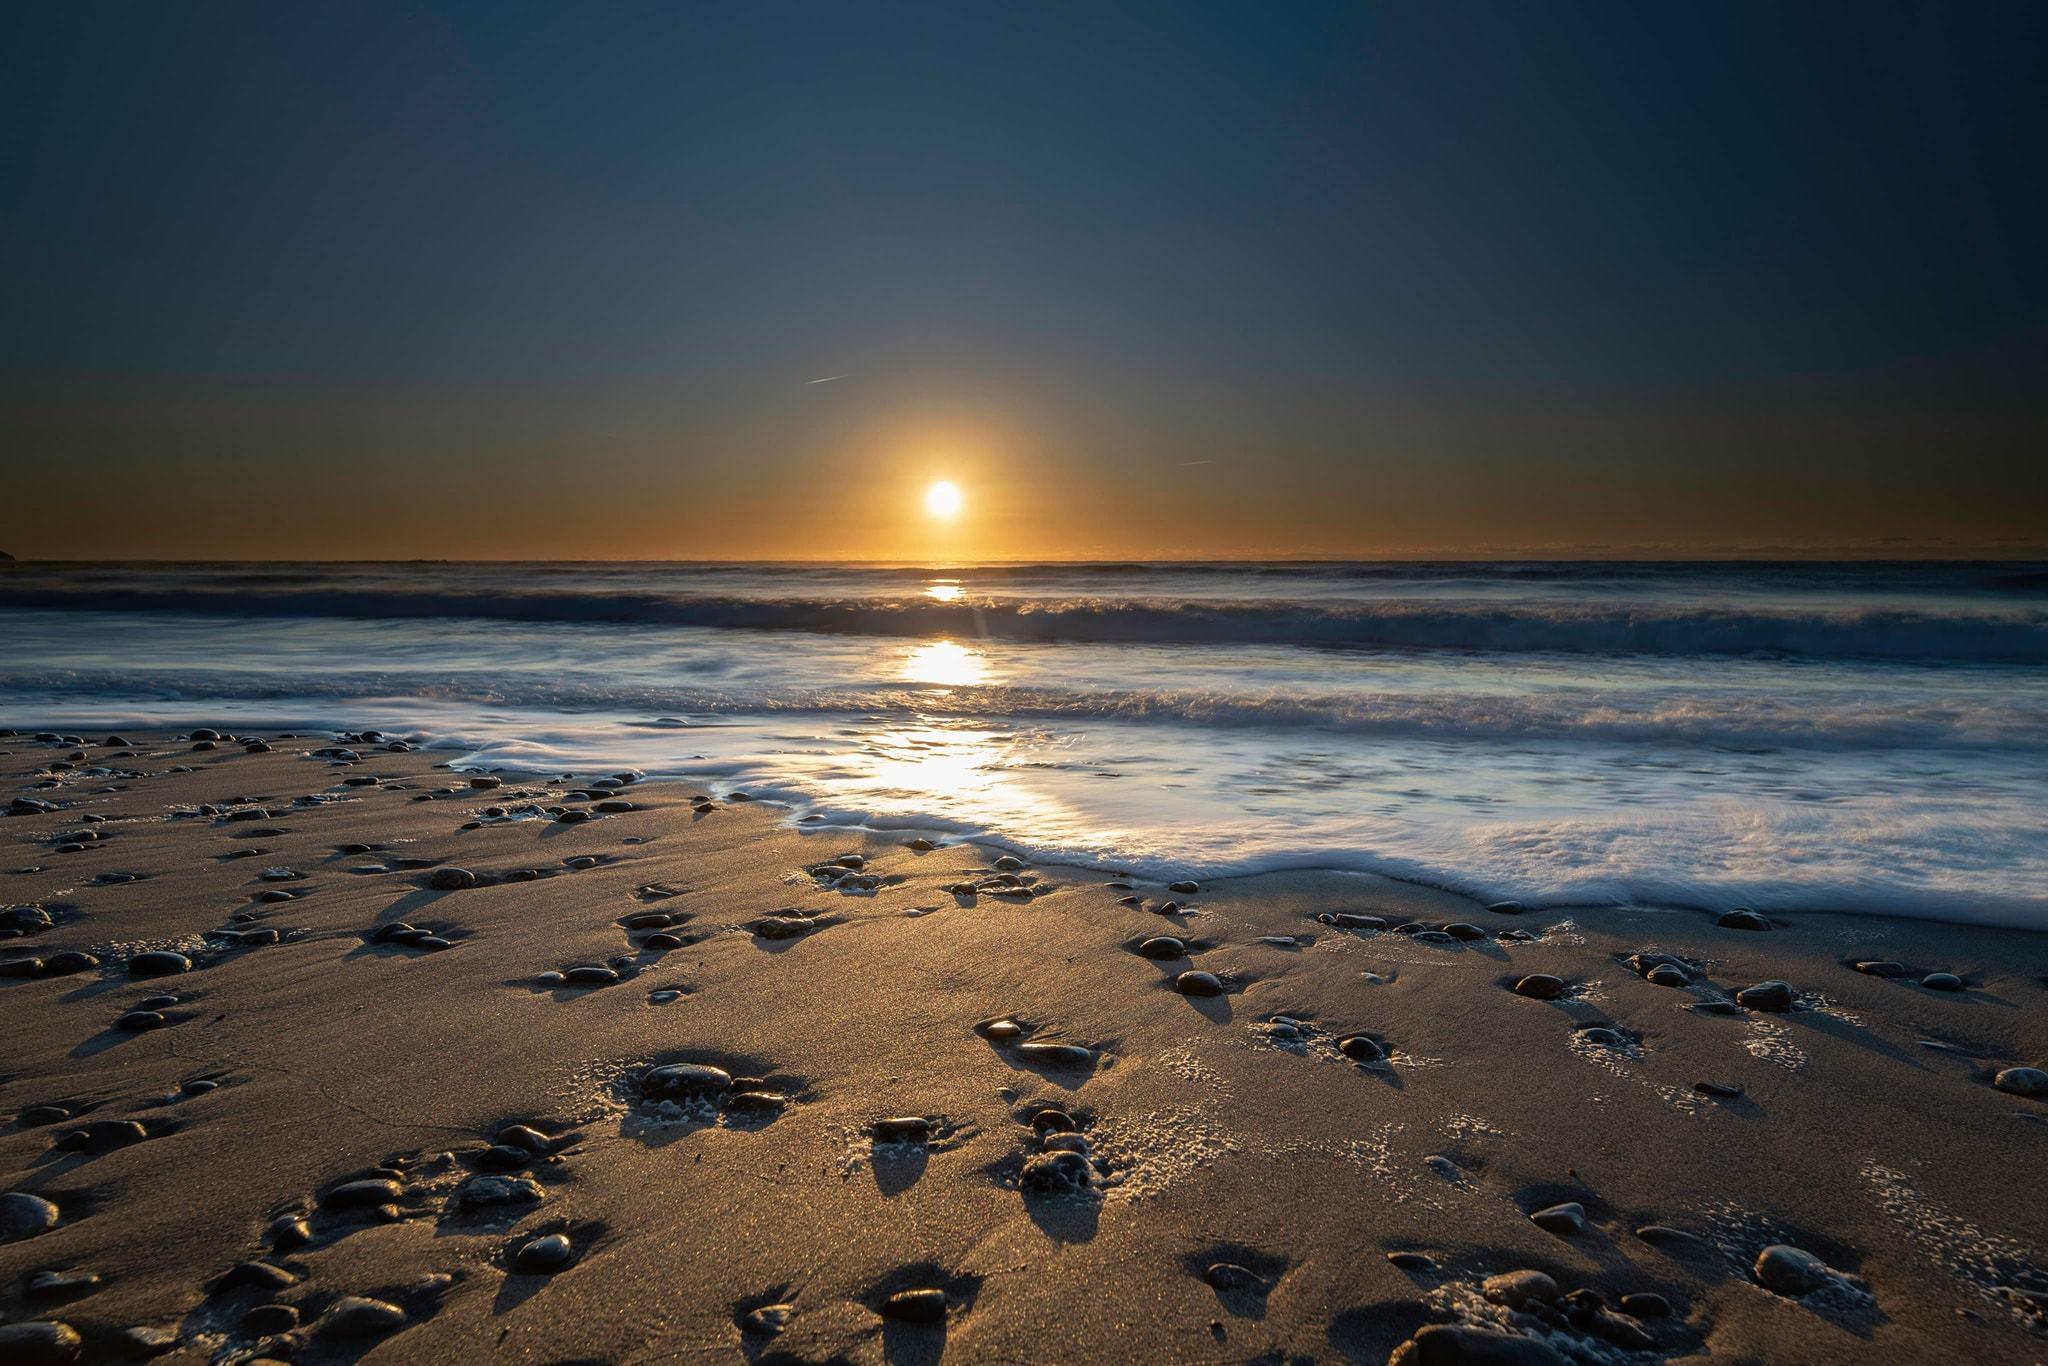 Beach sunset, by Steve Brickstock